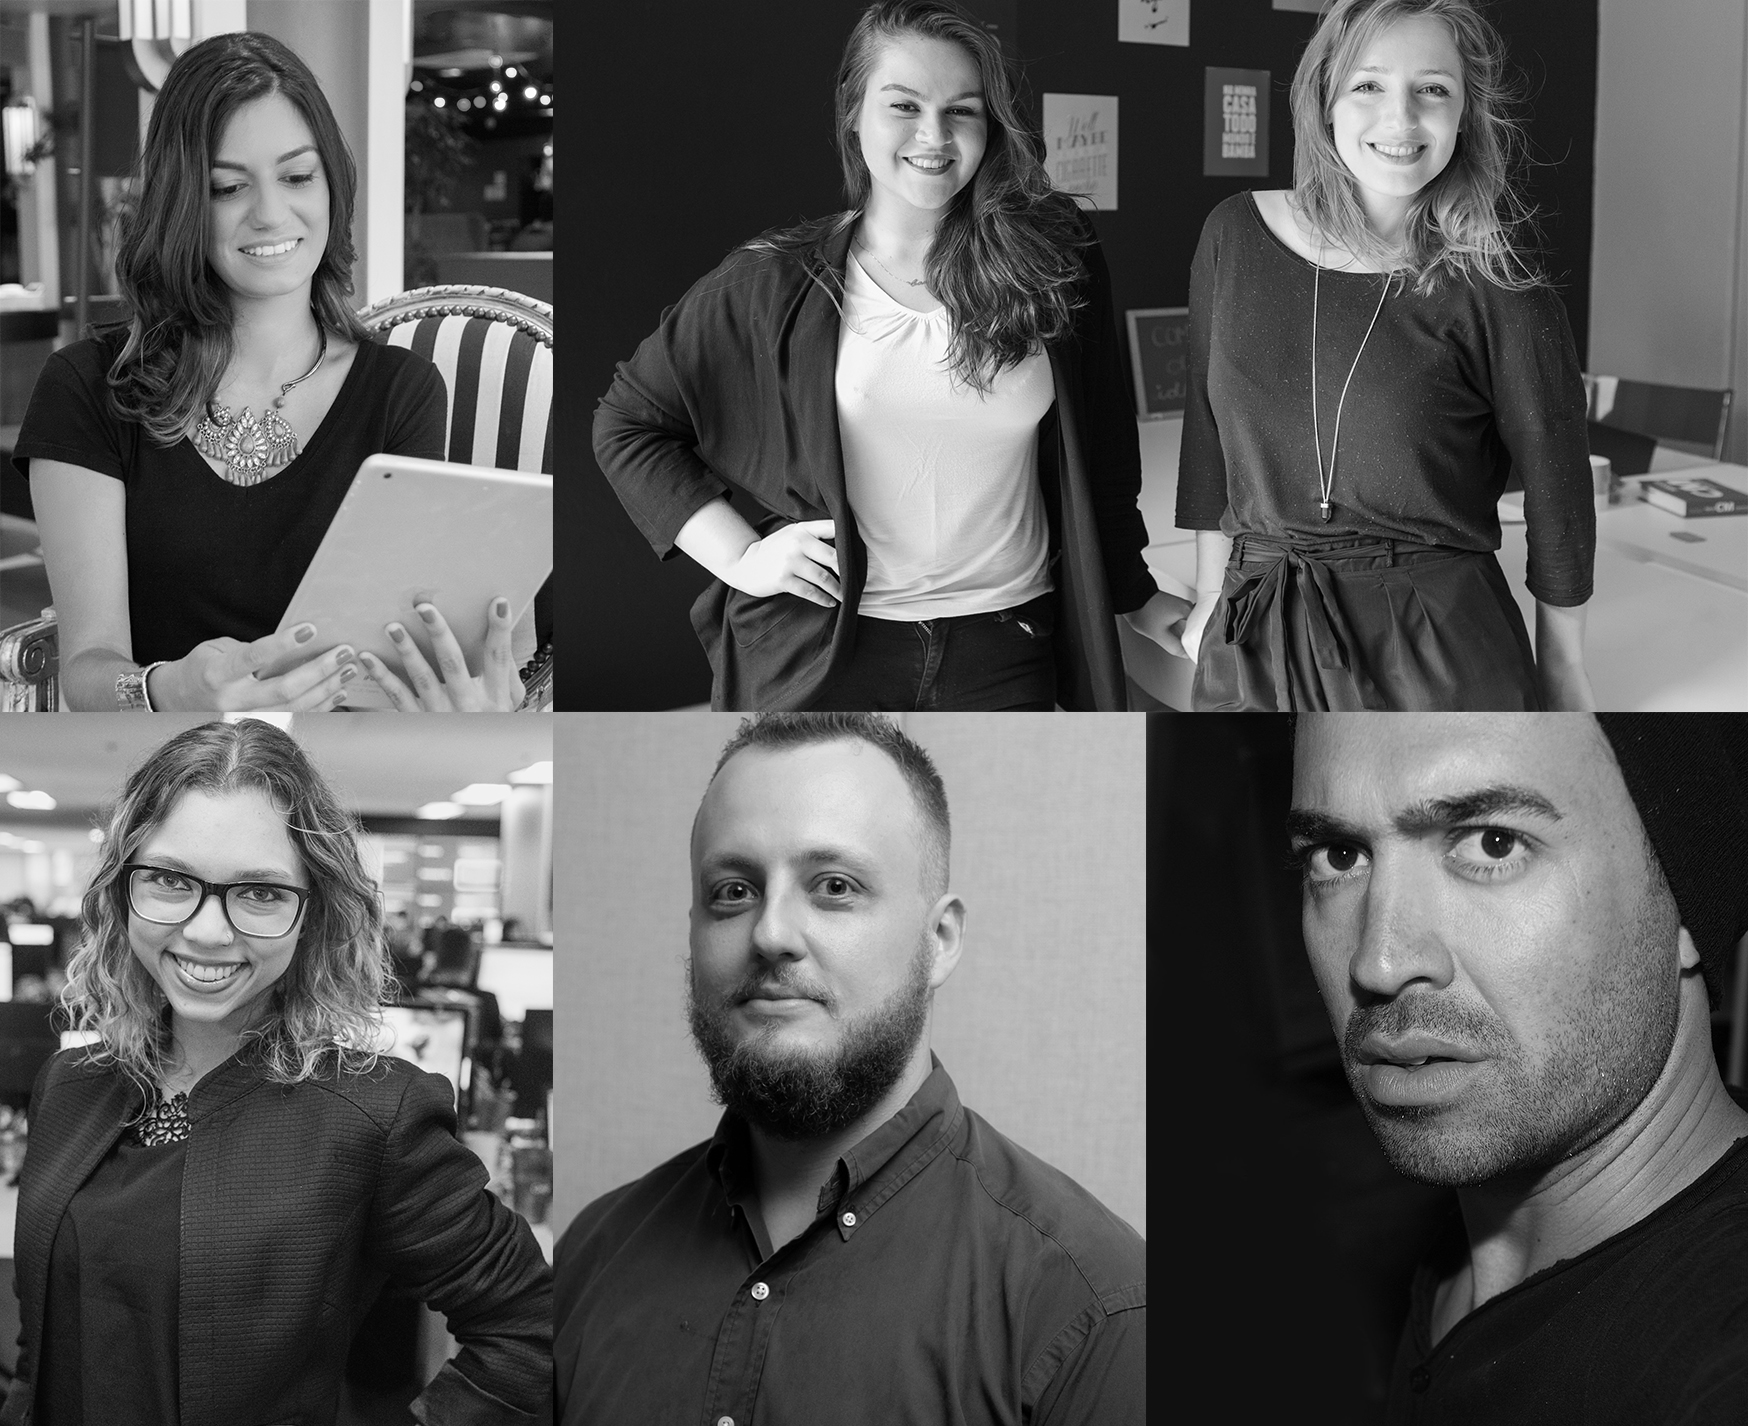 Os ministrantes dos workshops: Andressa Griffante, Camille Bonetto e Amanda Jacobus, Ana Maria Bicca, Leonardo Zanatta e Michel Flores.